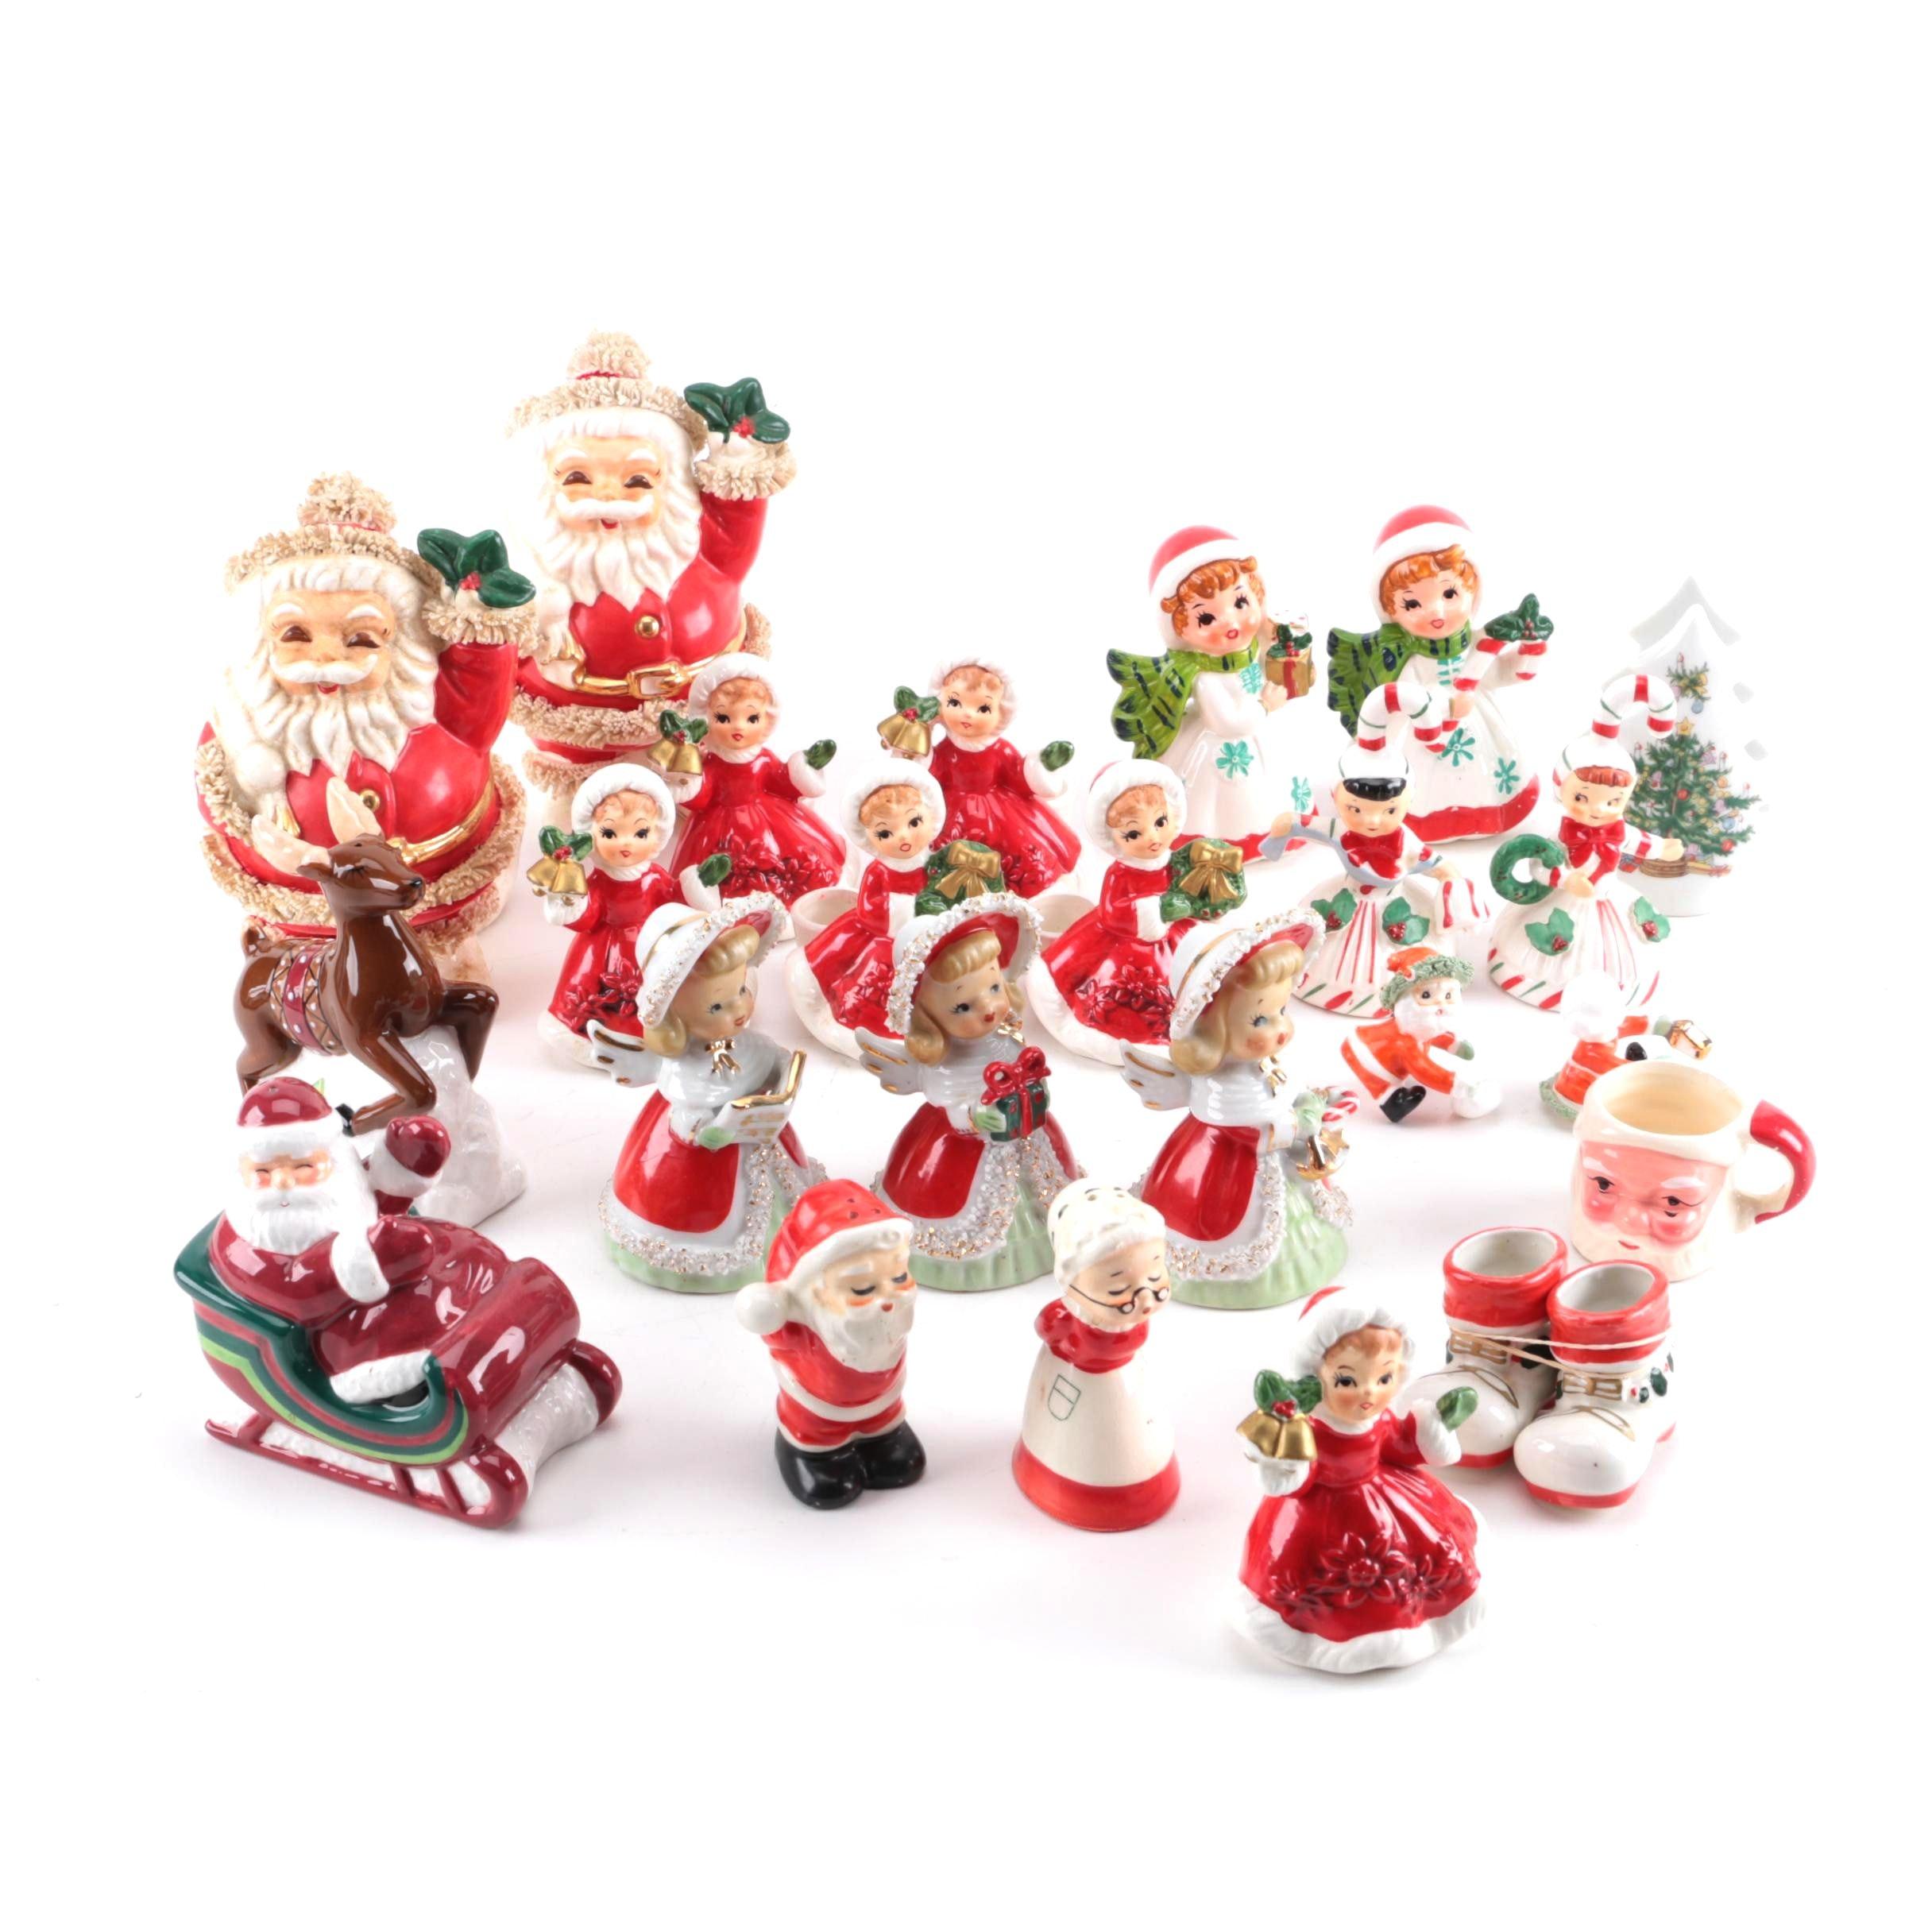 Vintage Holiday Figurines Featuring Lefton